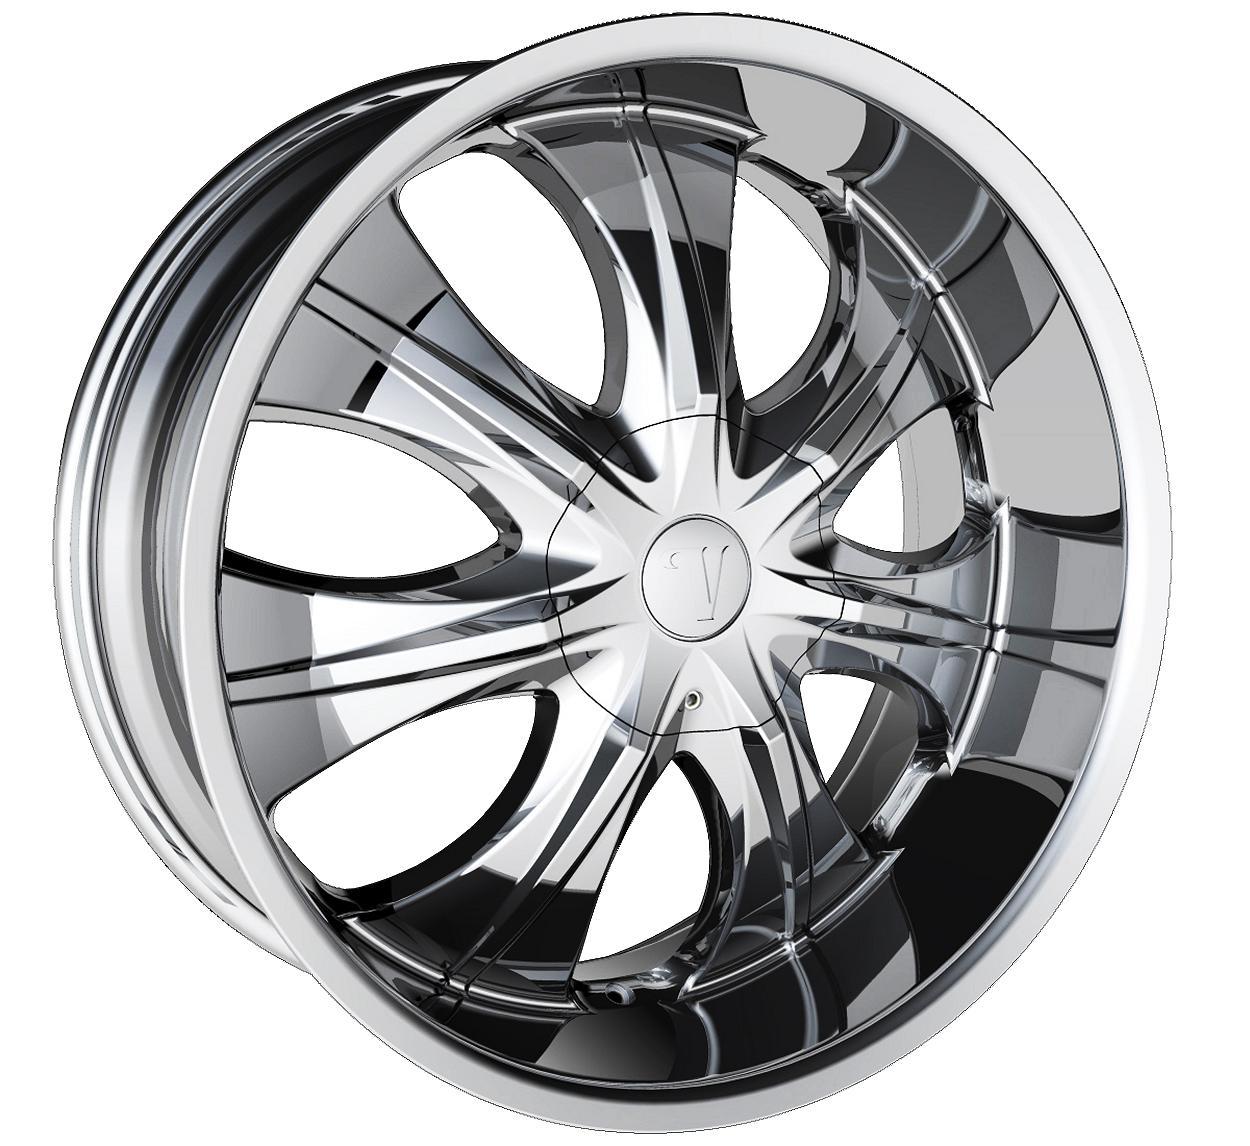 Velocity V750 Chrome wheels